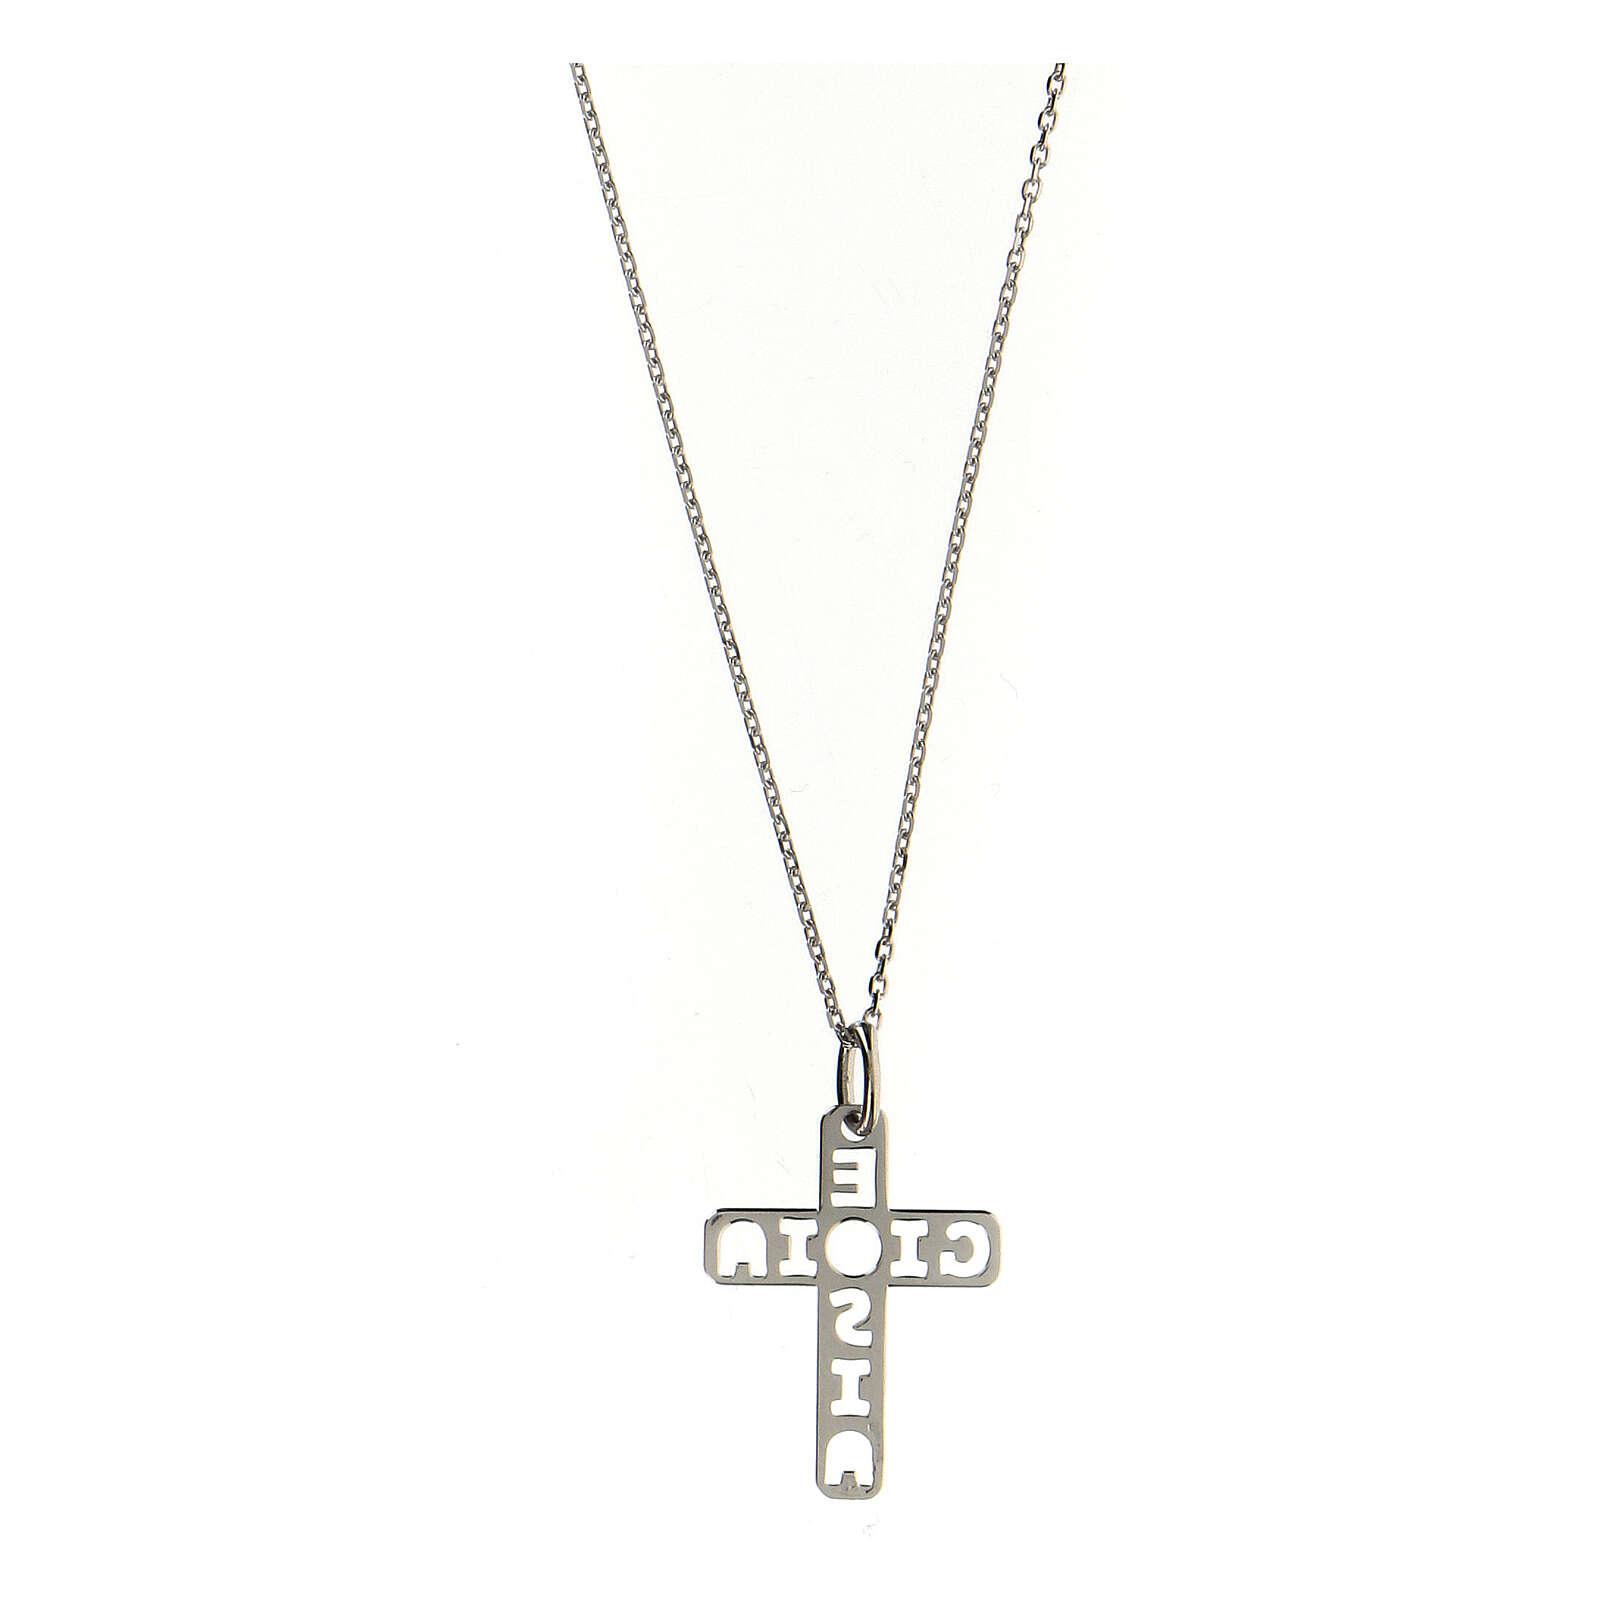 Colgante E Gioia Sia cruz plata 925 4